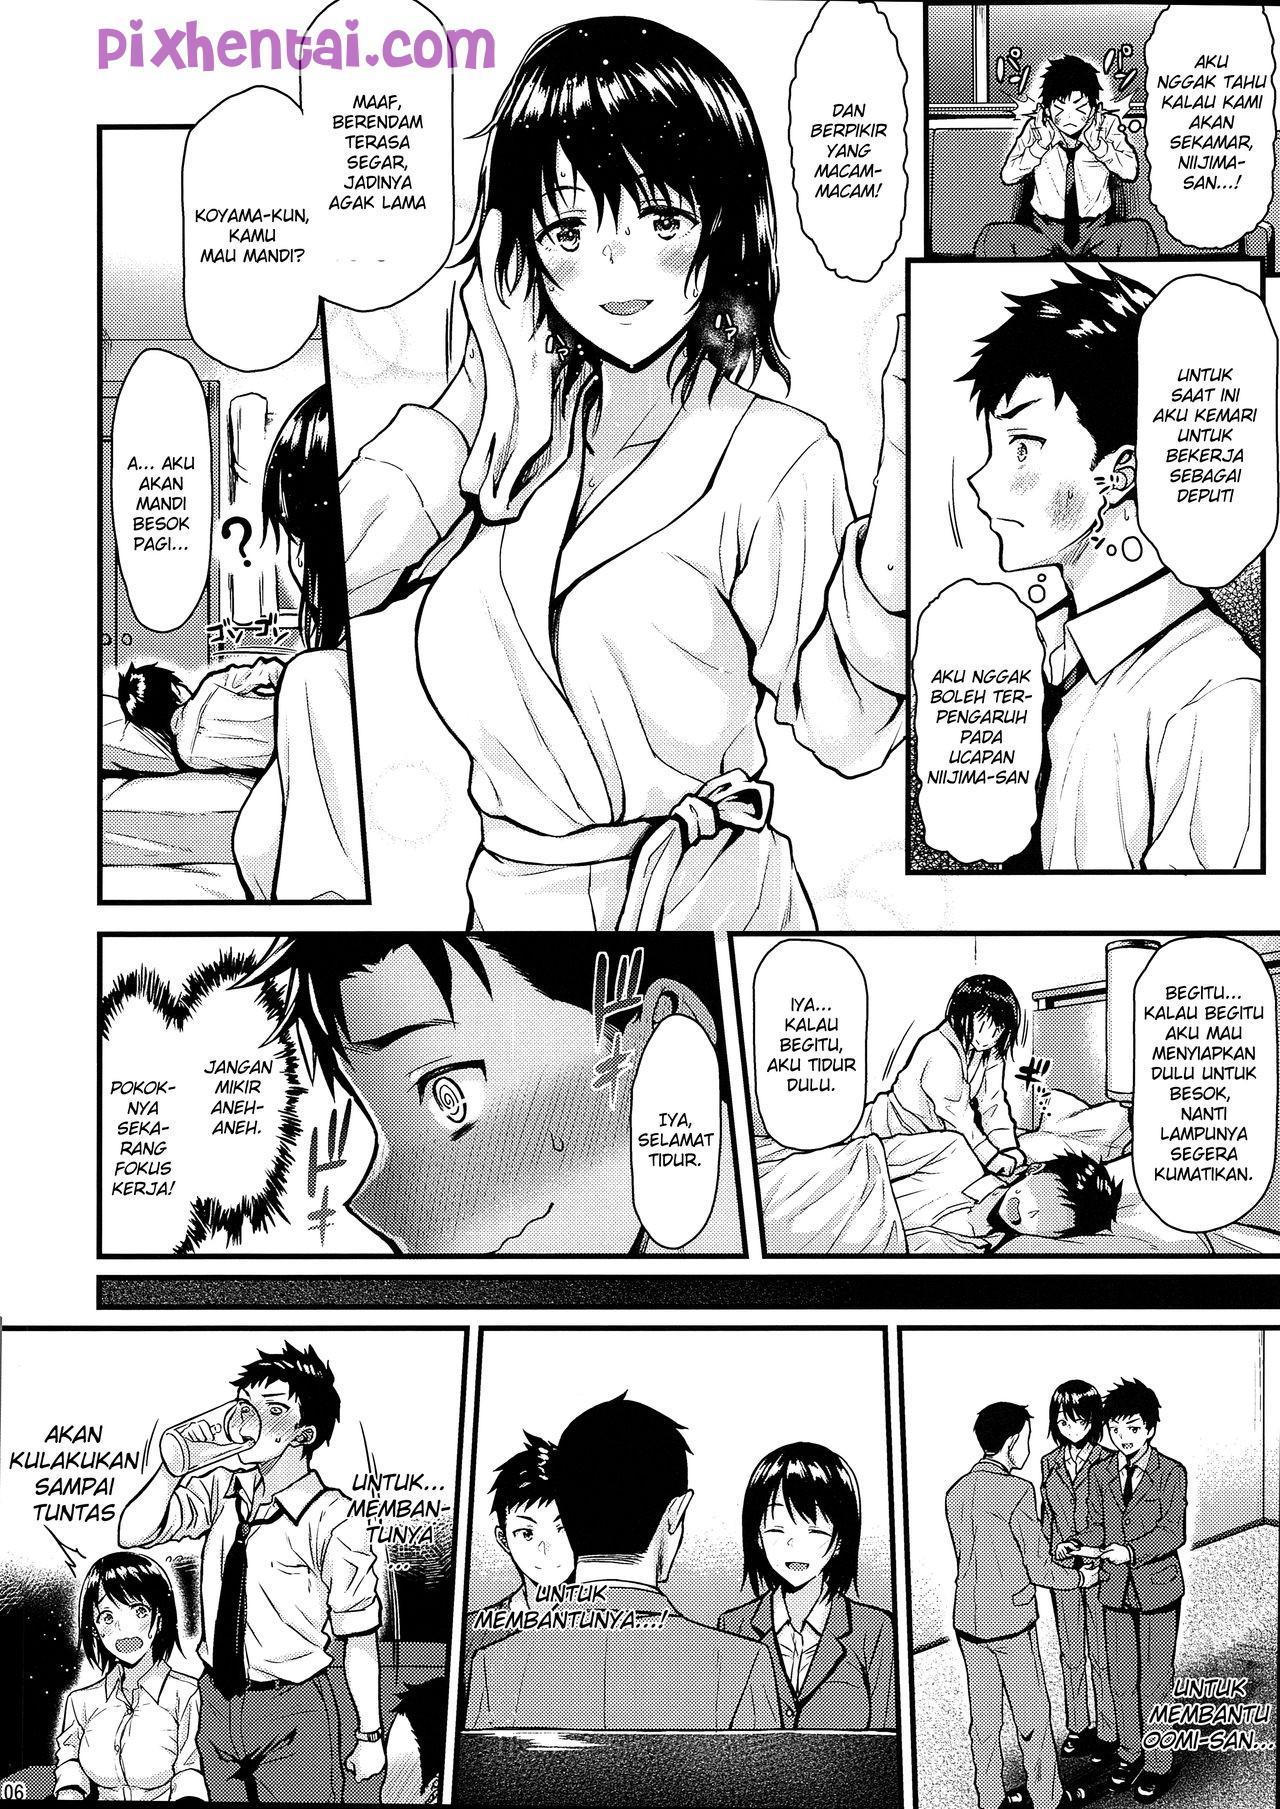 Komik hentai xxx manga sex bokep deputi ngentot sekretaris bohay di hotel 05